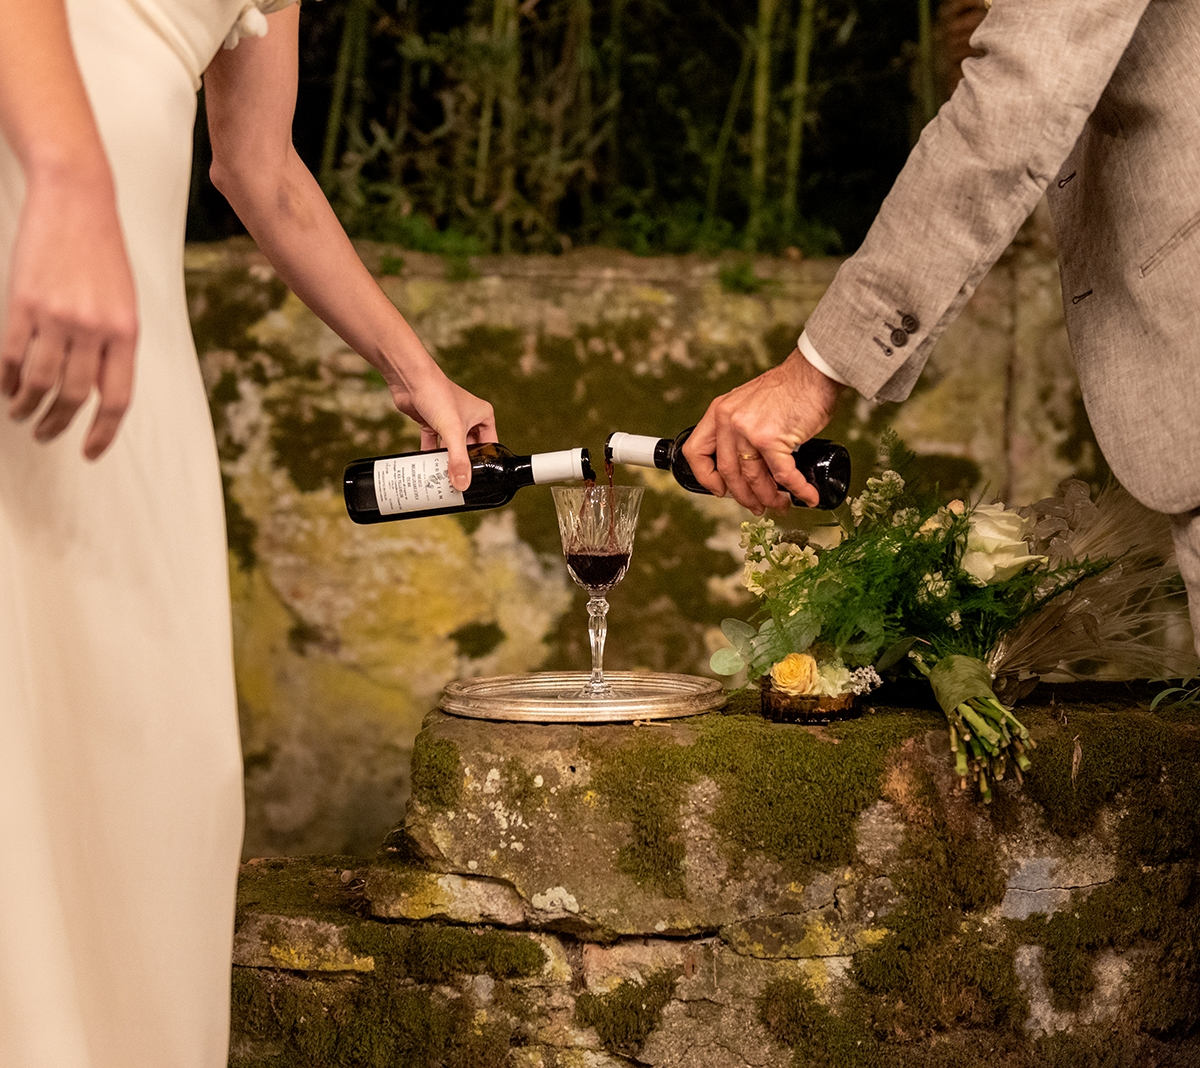 wedding-ceremony-ritual-of-wine-blending